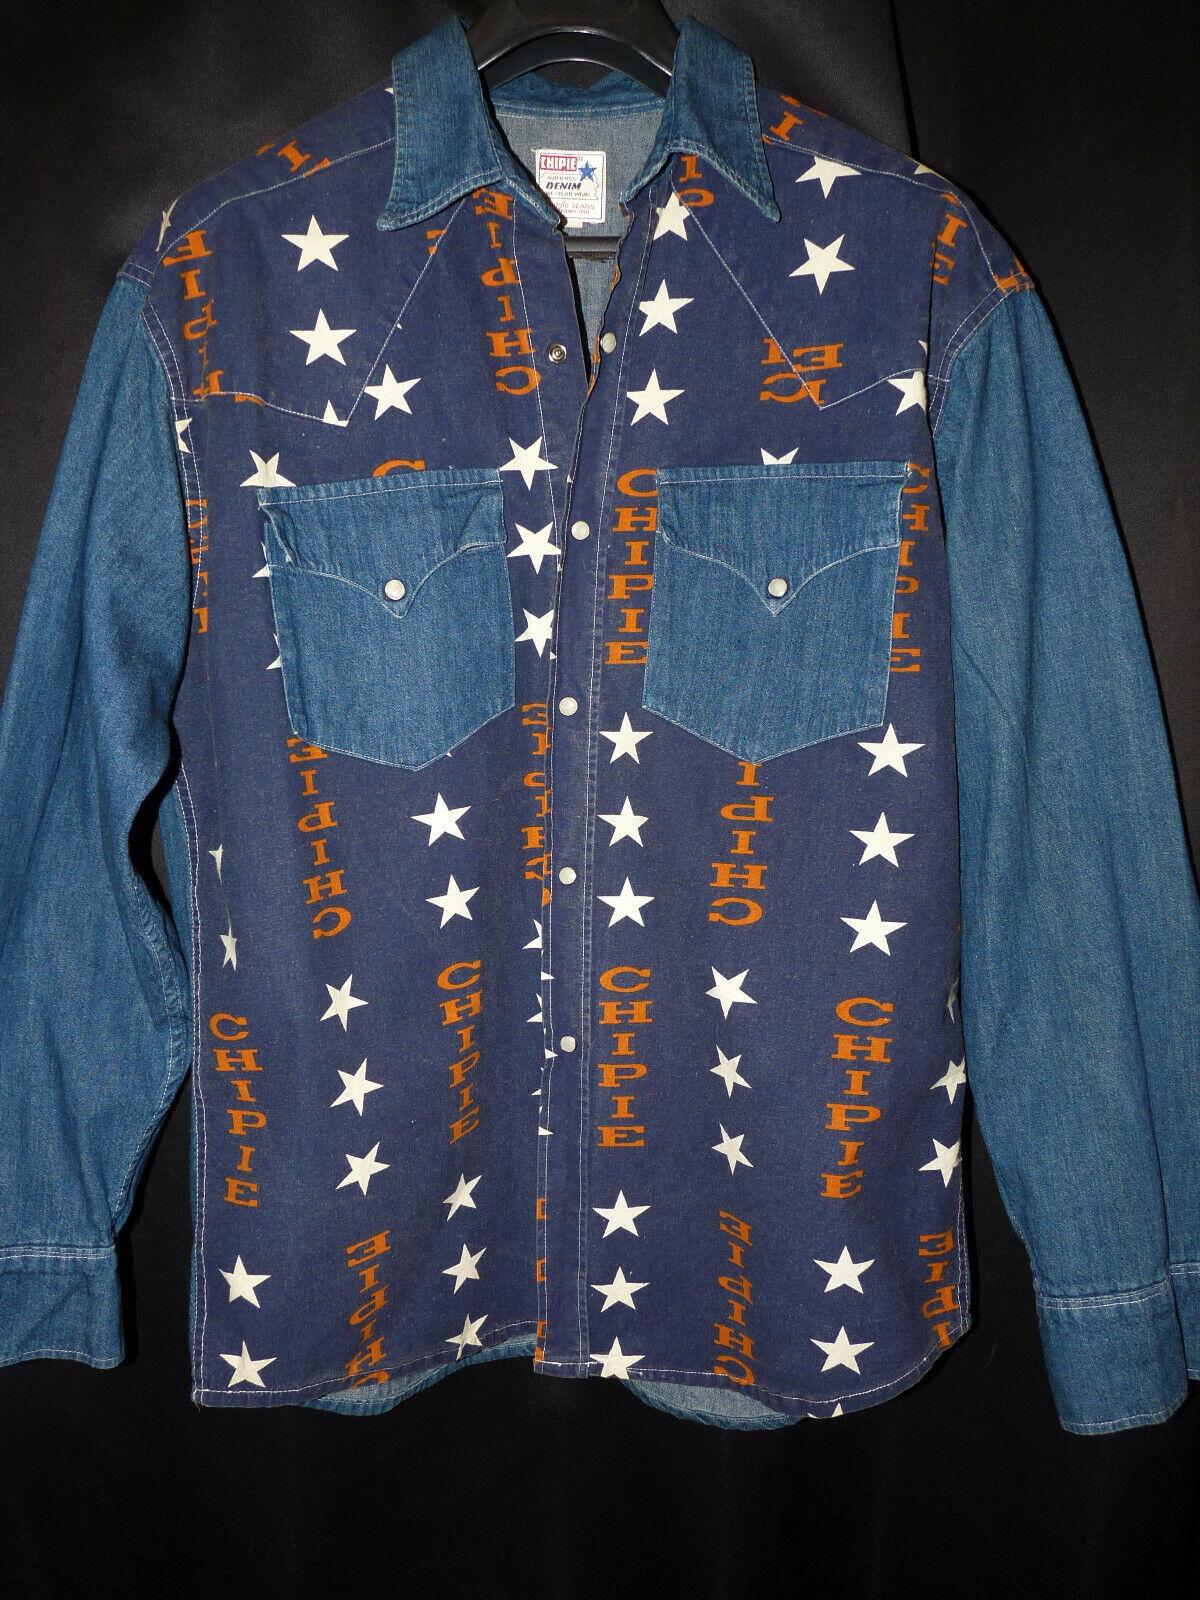 Chemise en jean rare vintage chipie jeans french style western country Étoile xl